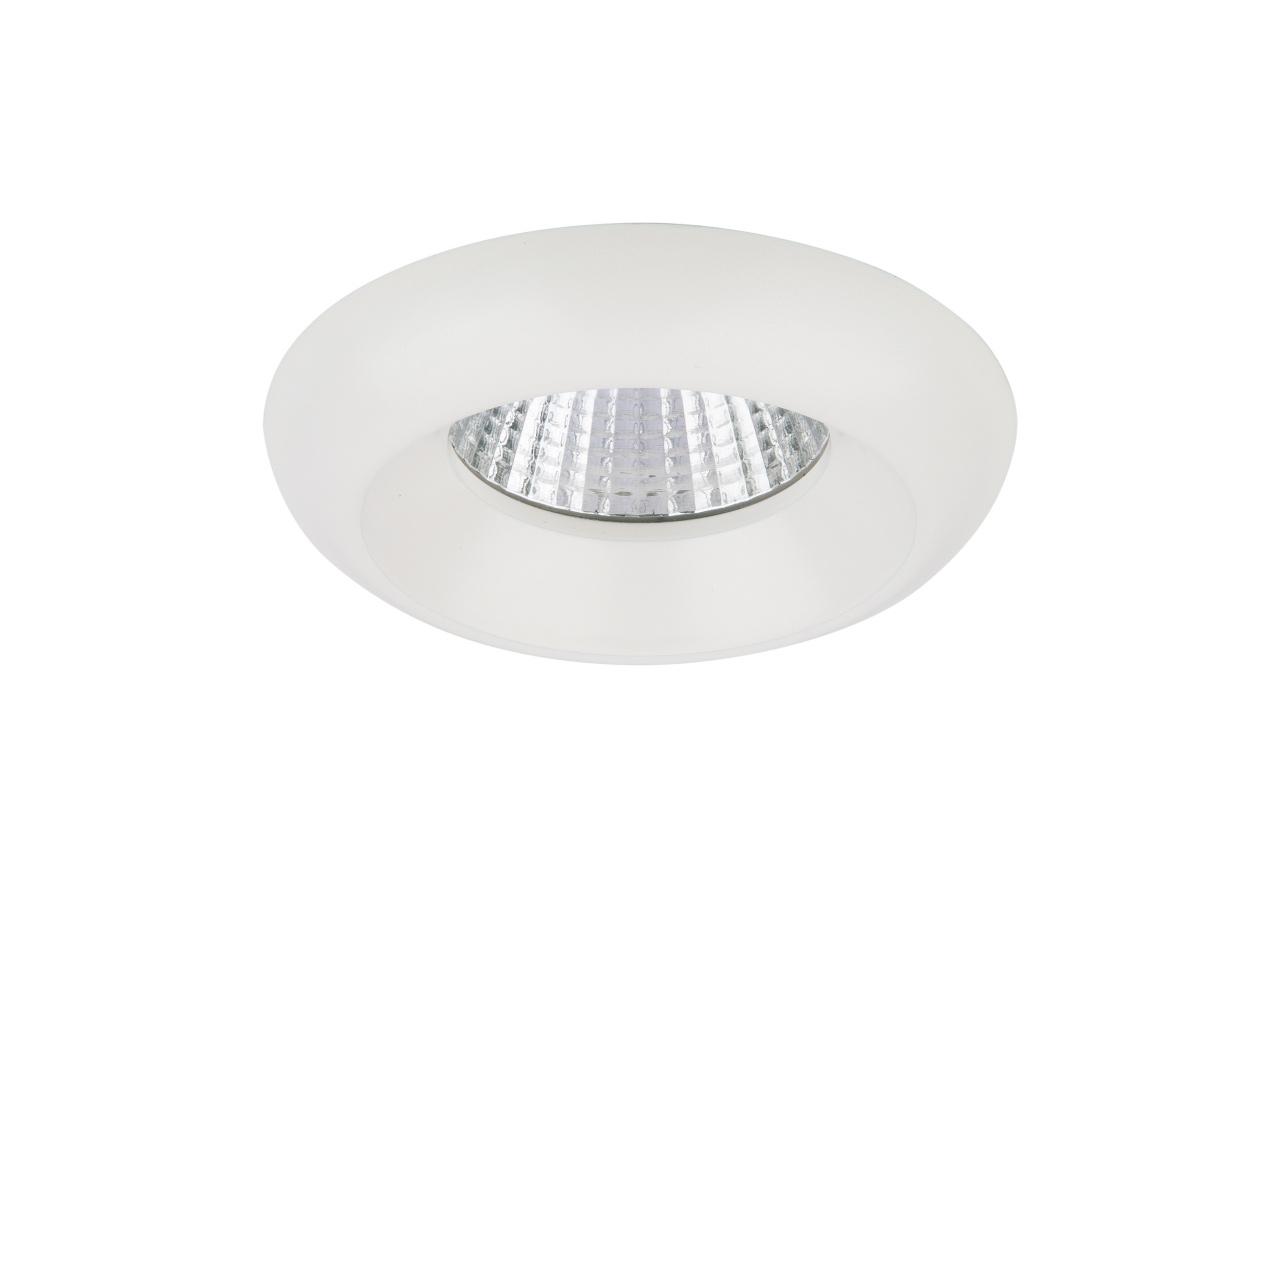 Светильник Monde LED 7W 560LM 50G белый 3000K Lightstar 071076